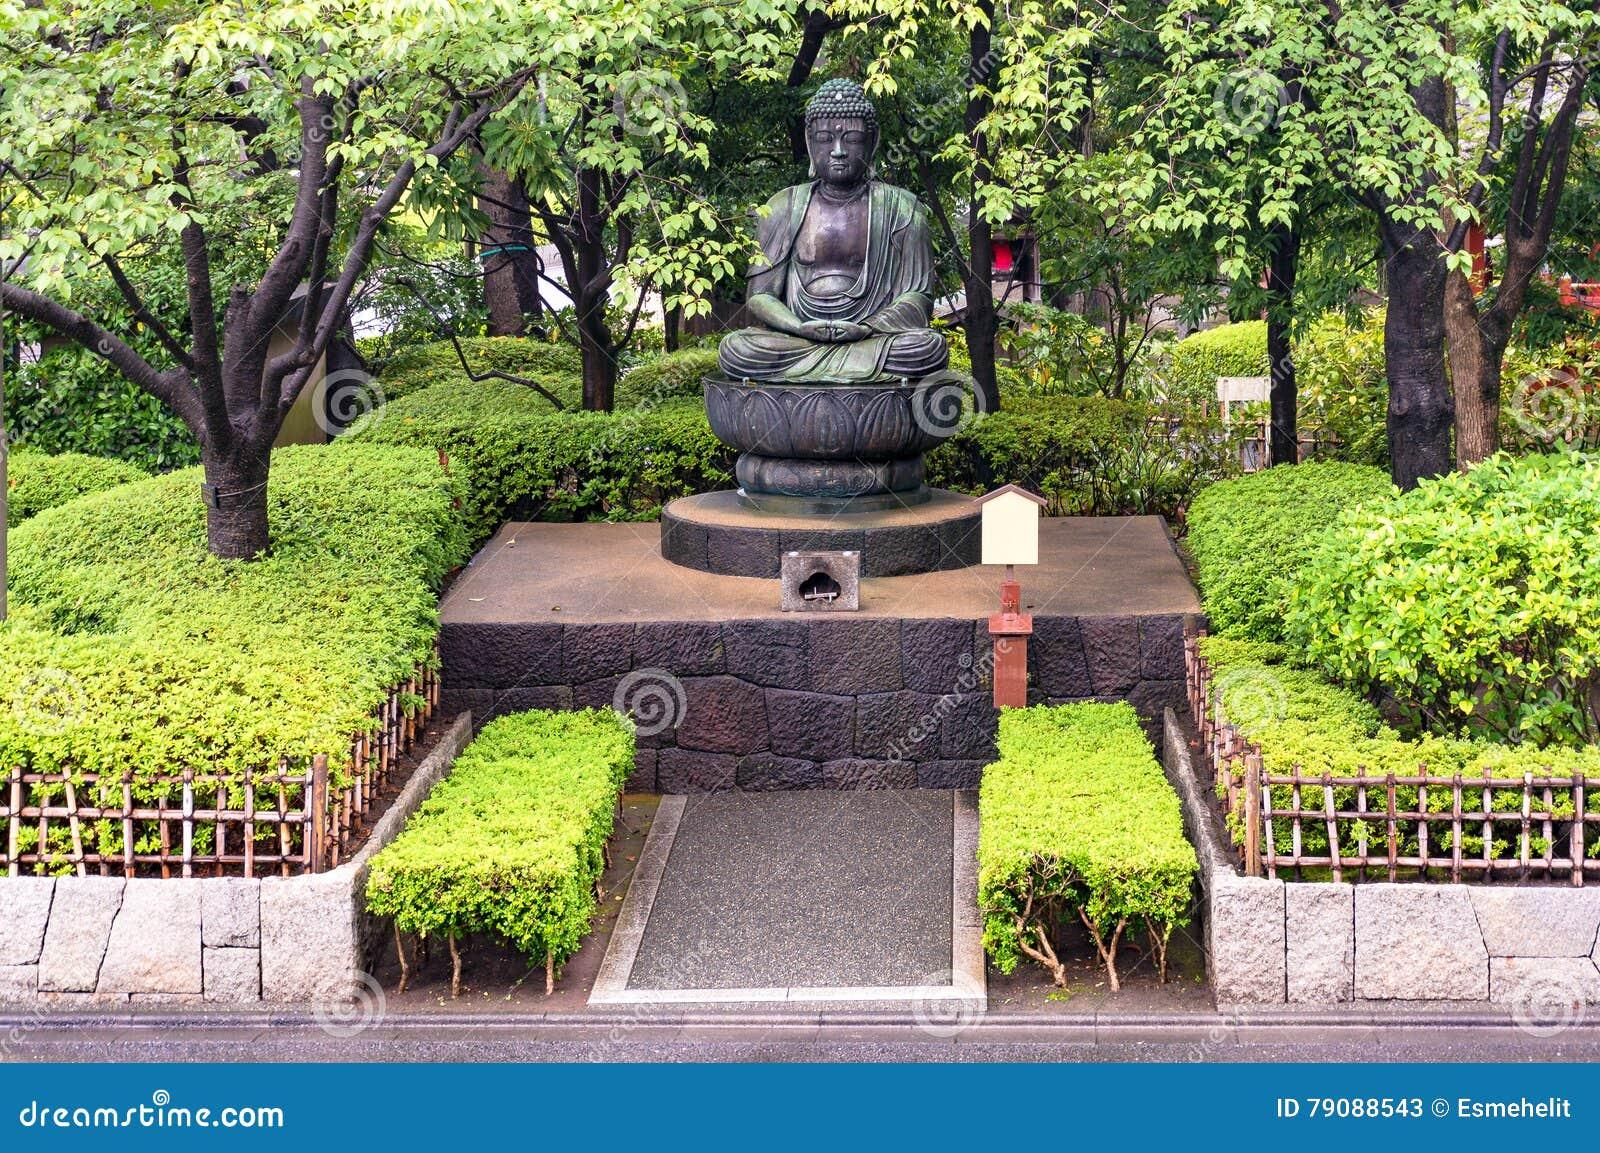 Estatua de buda en jard n japon s imagen de archivo for Jardin japones 2016